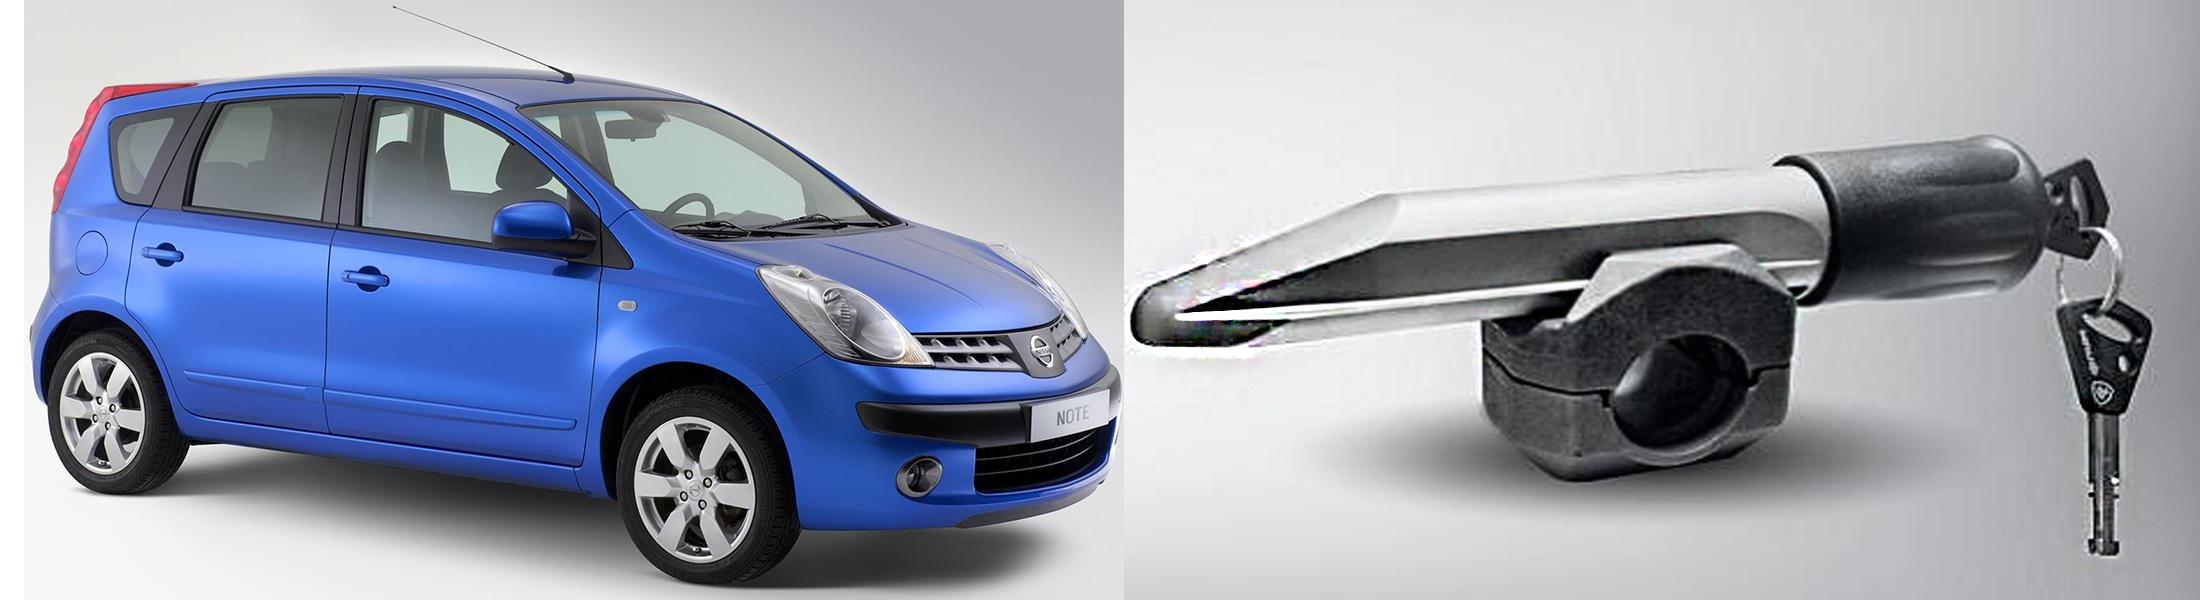 Nissan Note /2005-/М5 Элур, Гарант Блок Люкс 160.E/K